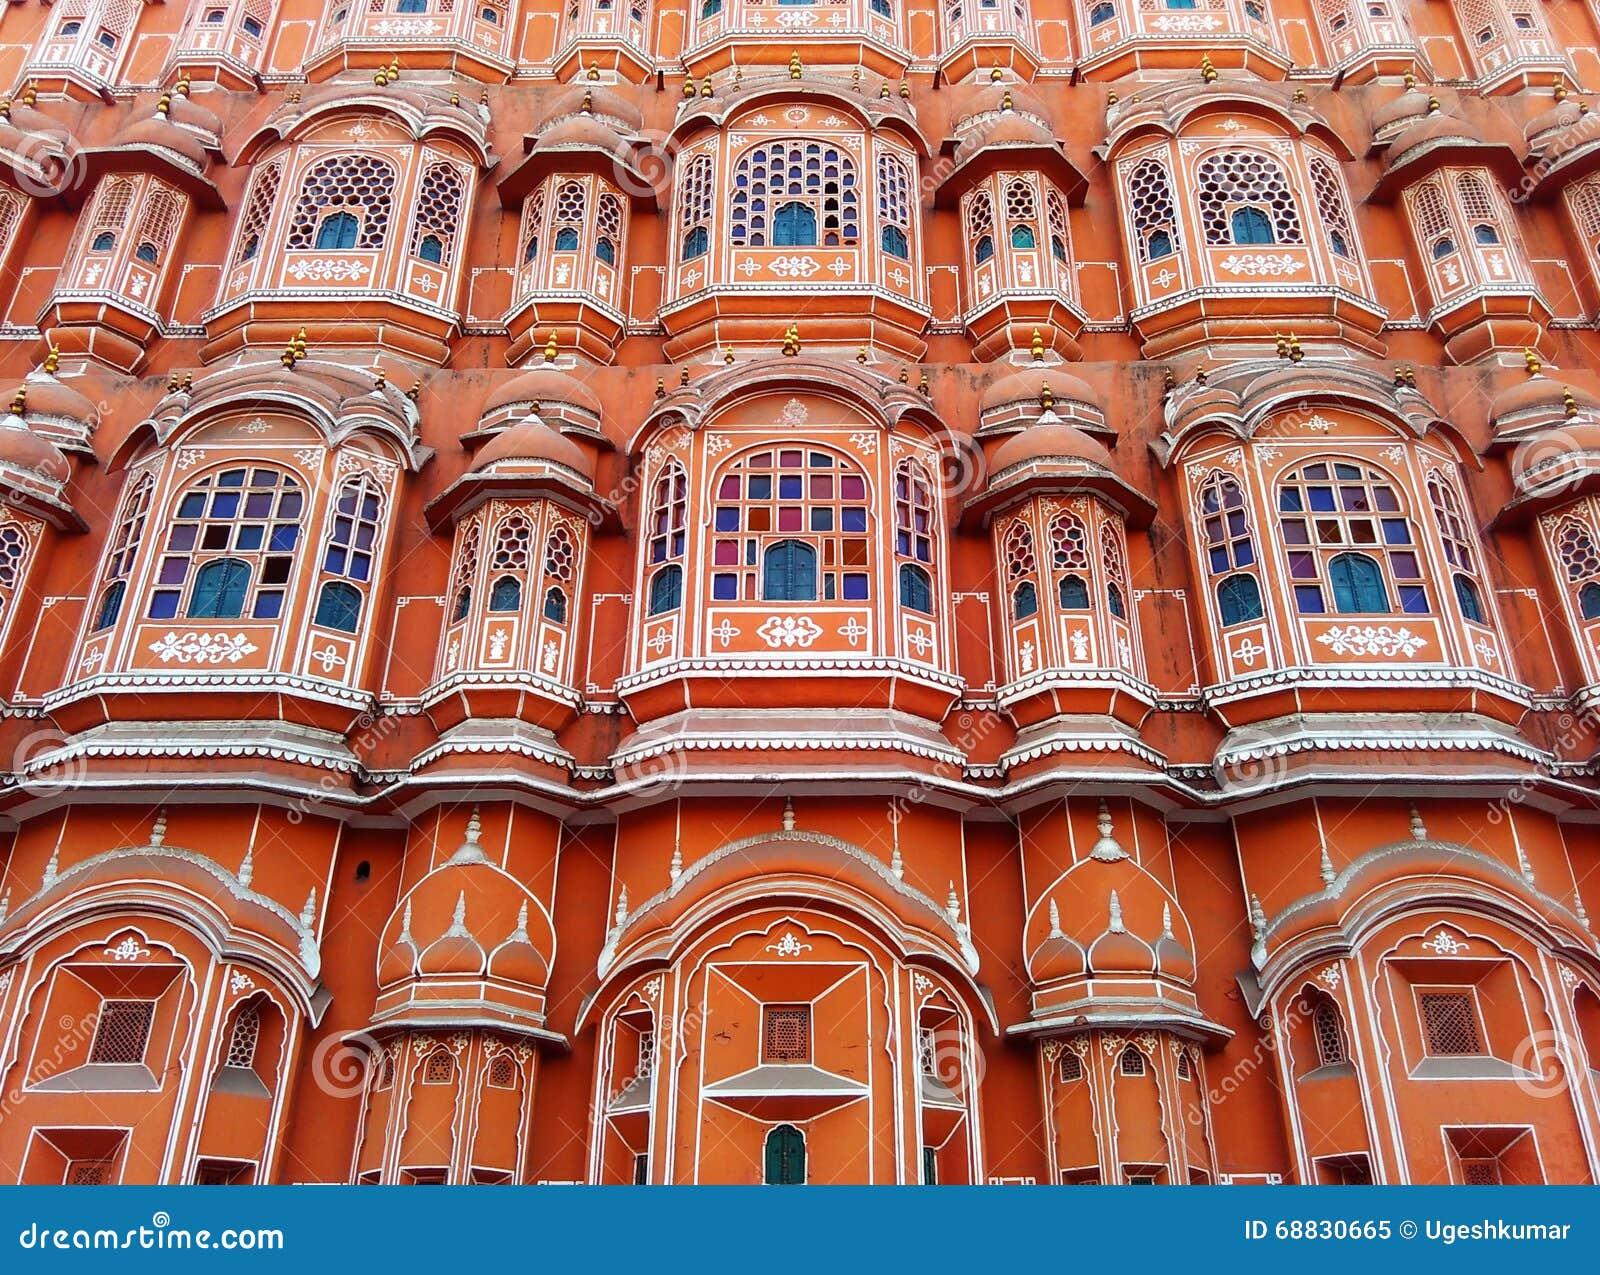 Beautiful Architecture Of Wind Palace Jaipur Rajasthan India Stock Photo